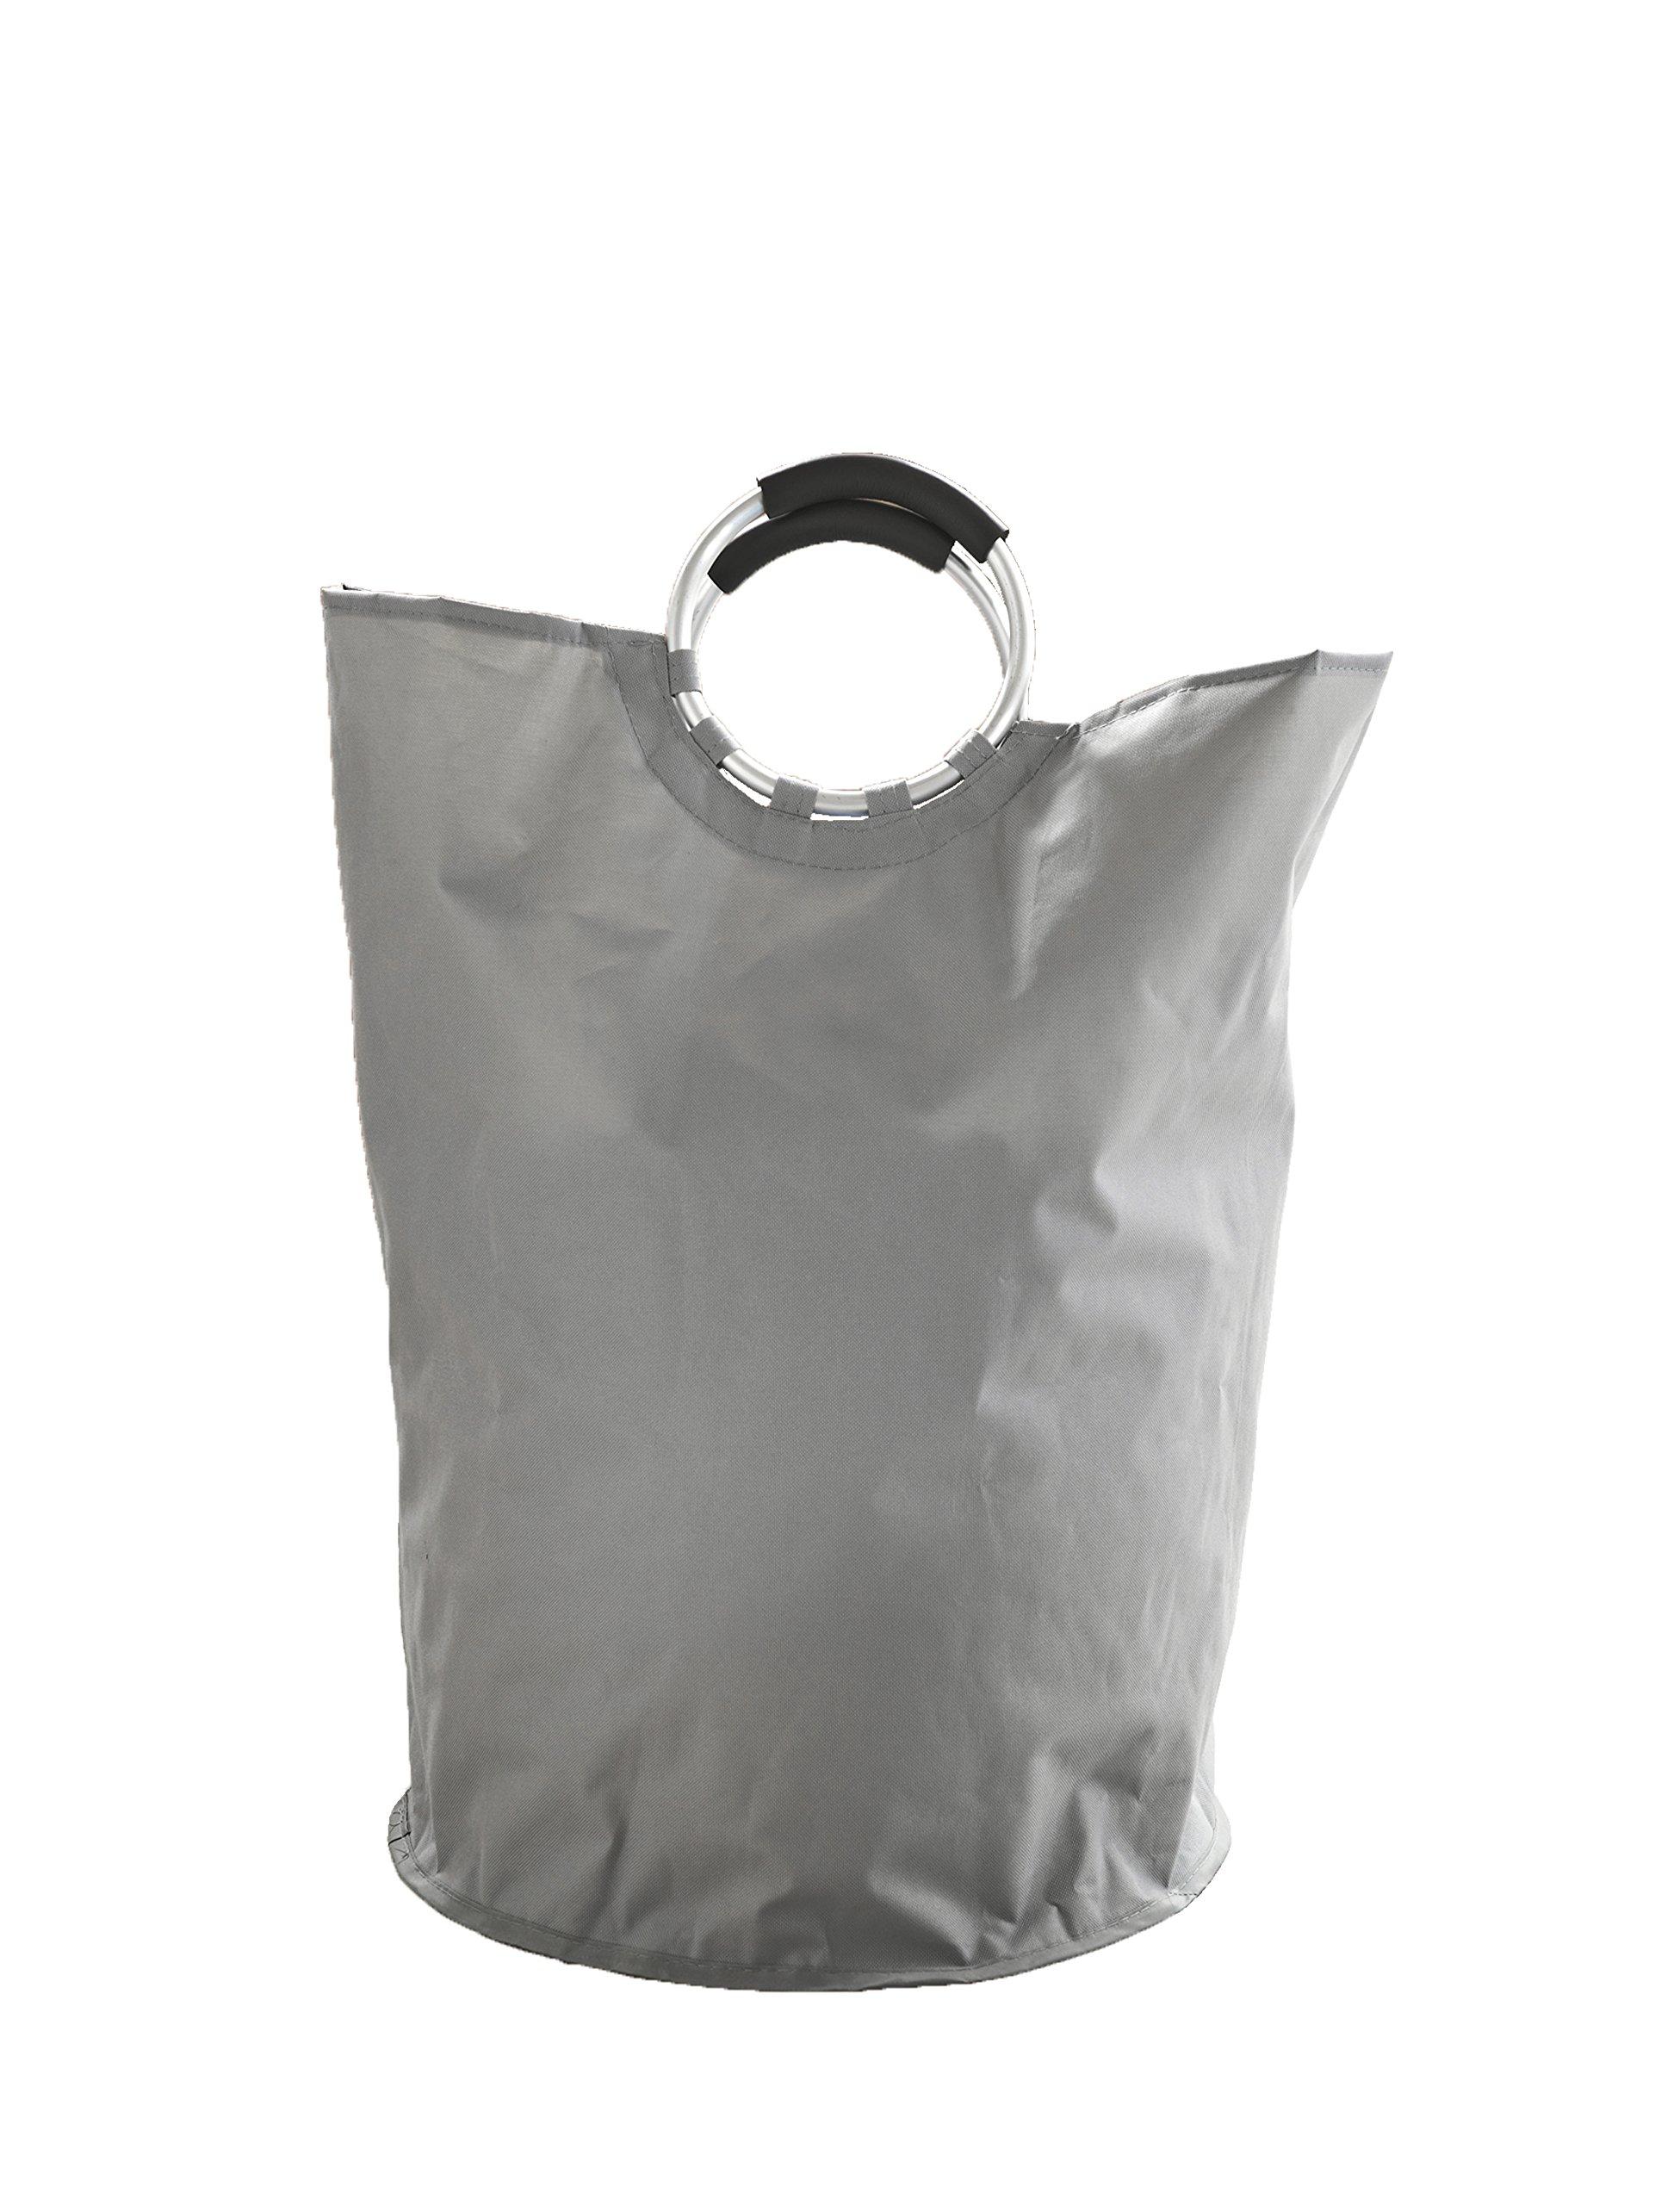 Hotel Oxford Laundry Bag- Grey